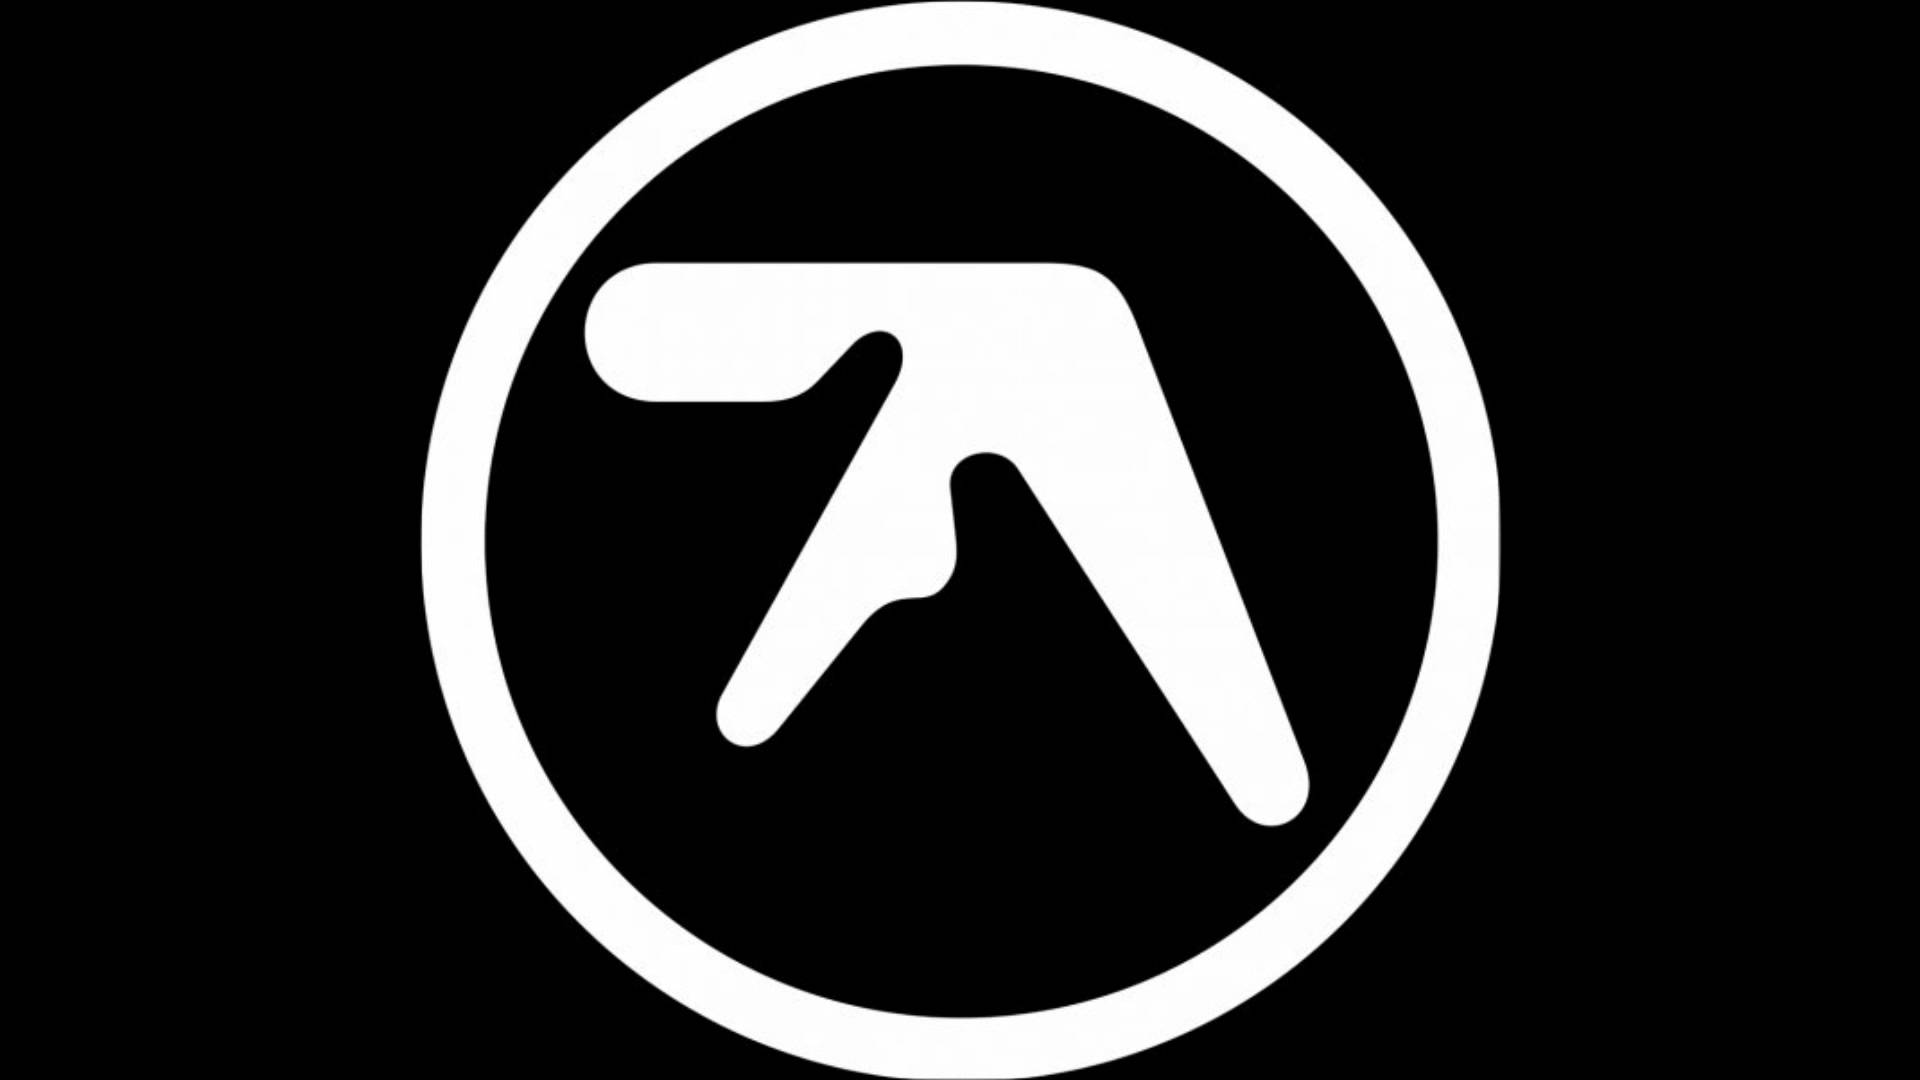 Aphex Twin Backgrounds, Compatible - PC, Mobile, Gadgets| 1920x1080 px